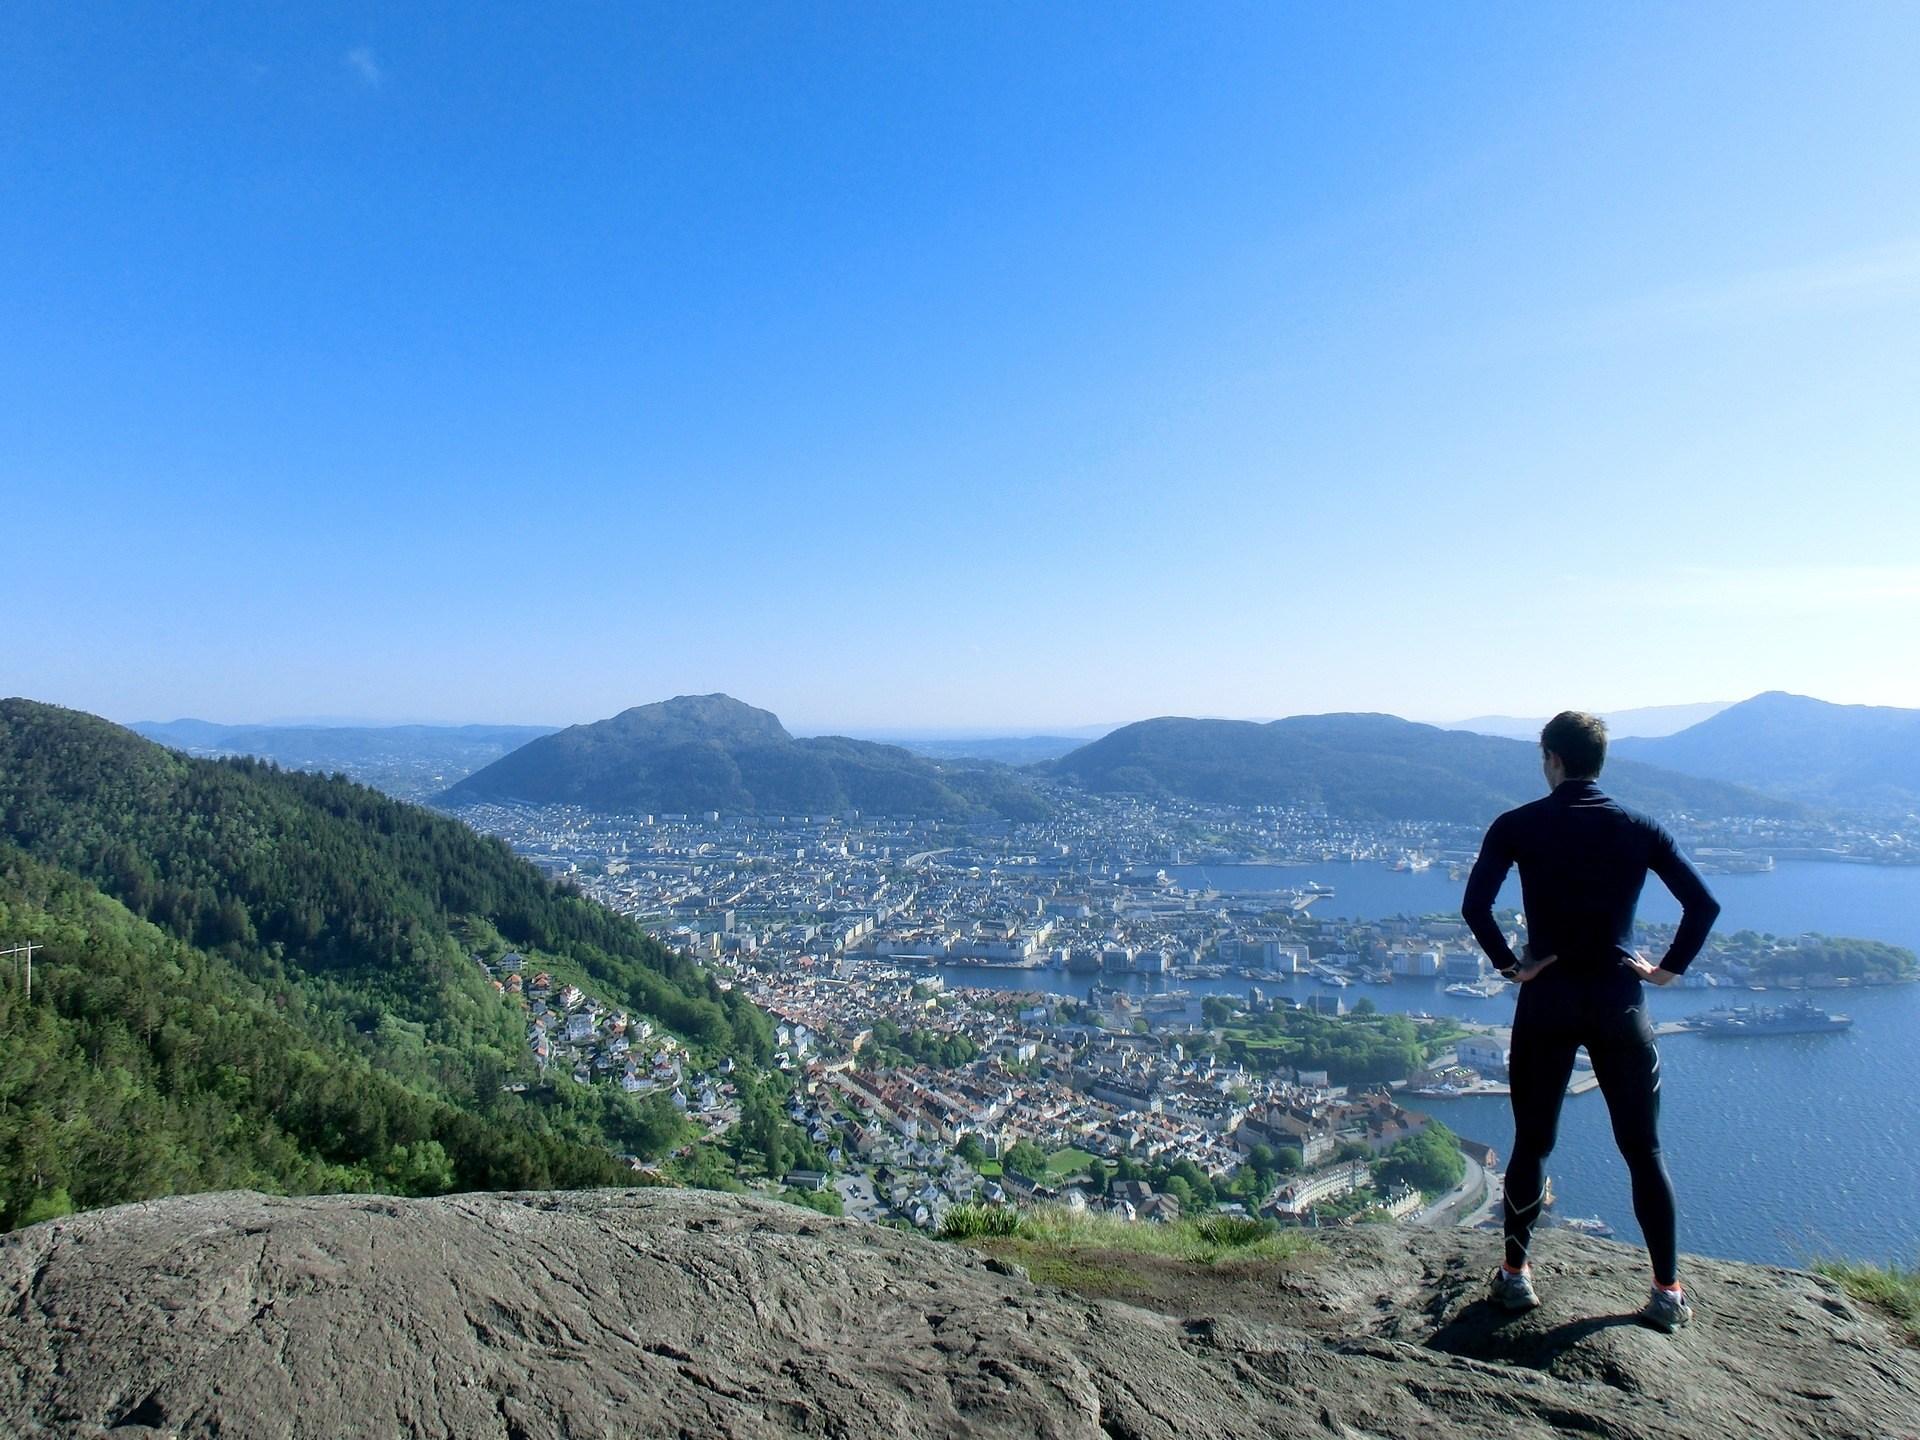 De Syv Fjell I Bergen